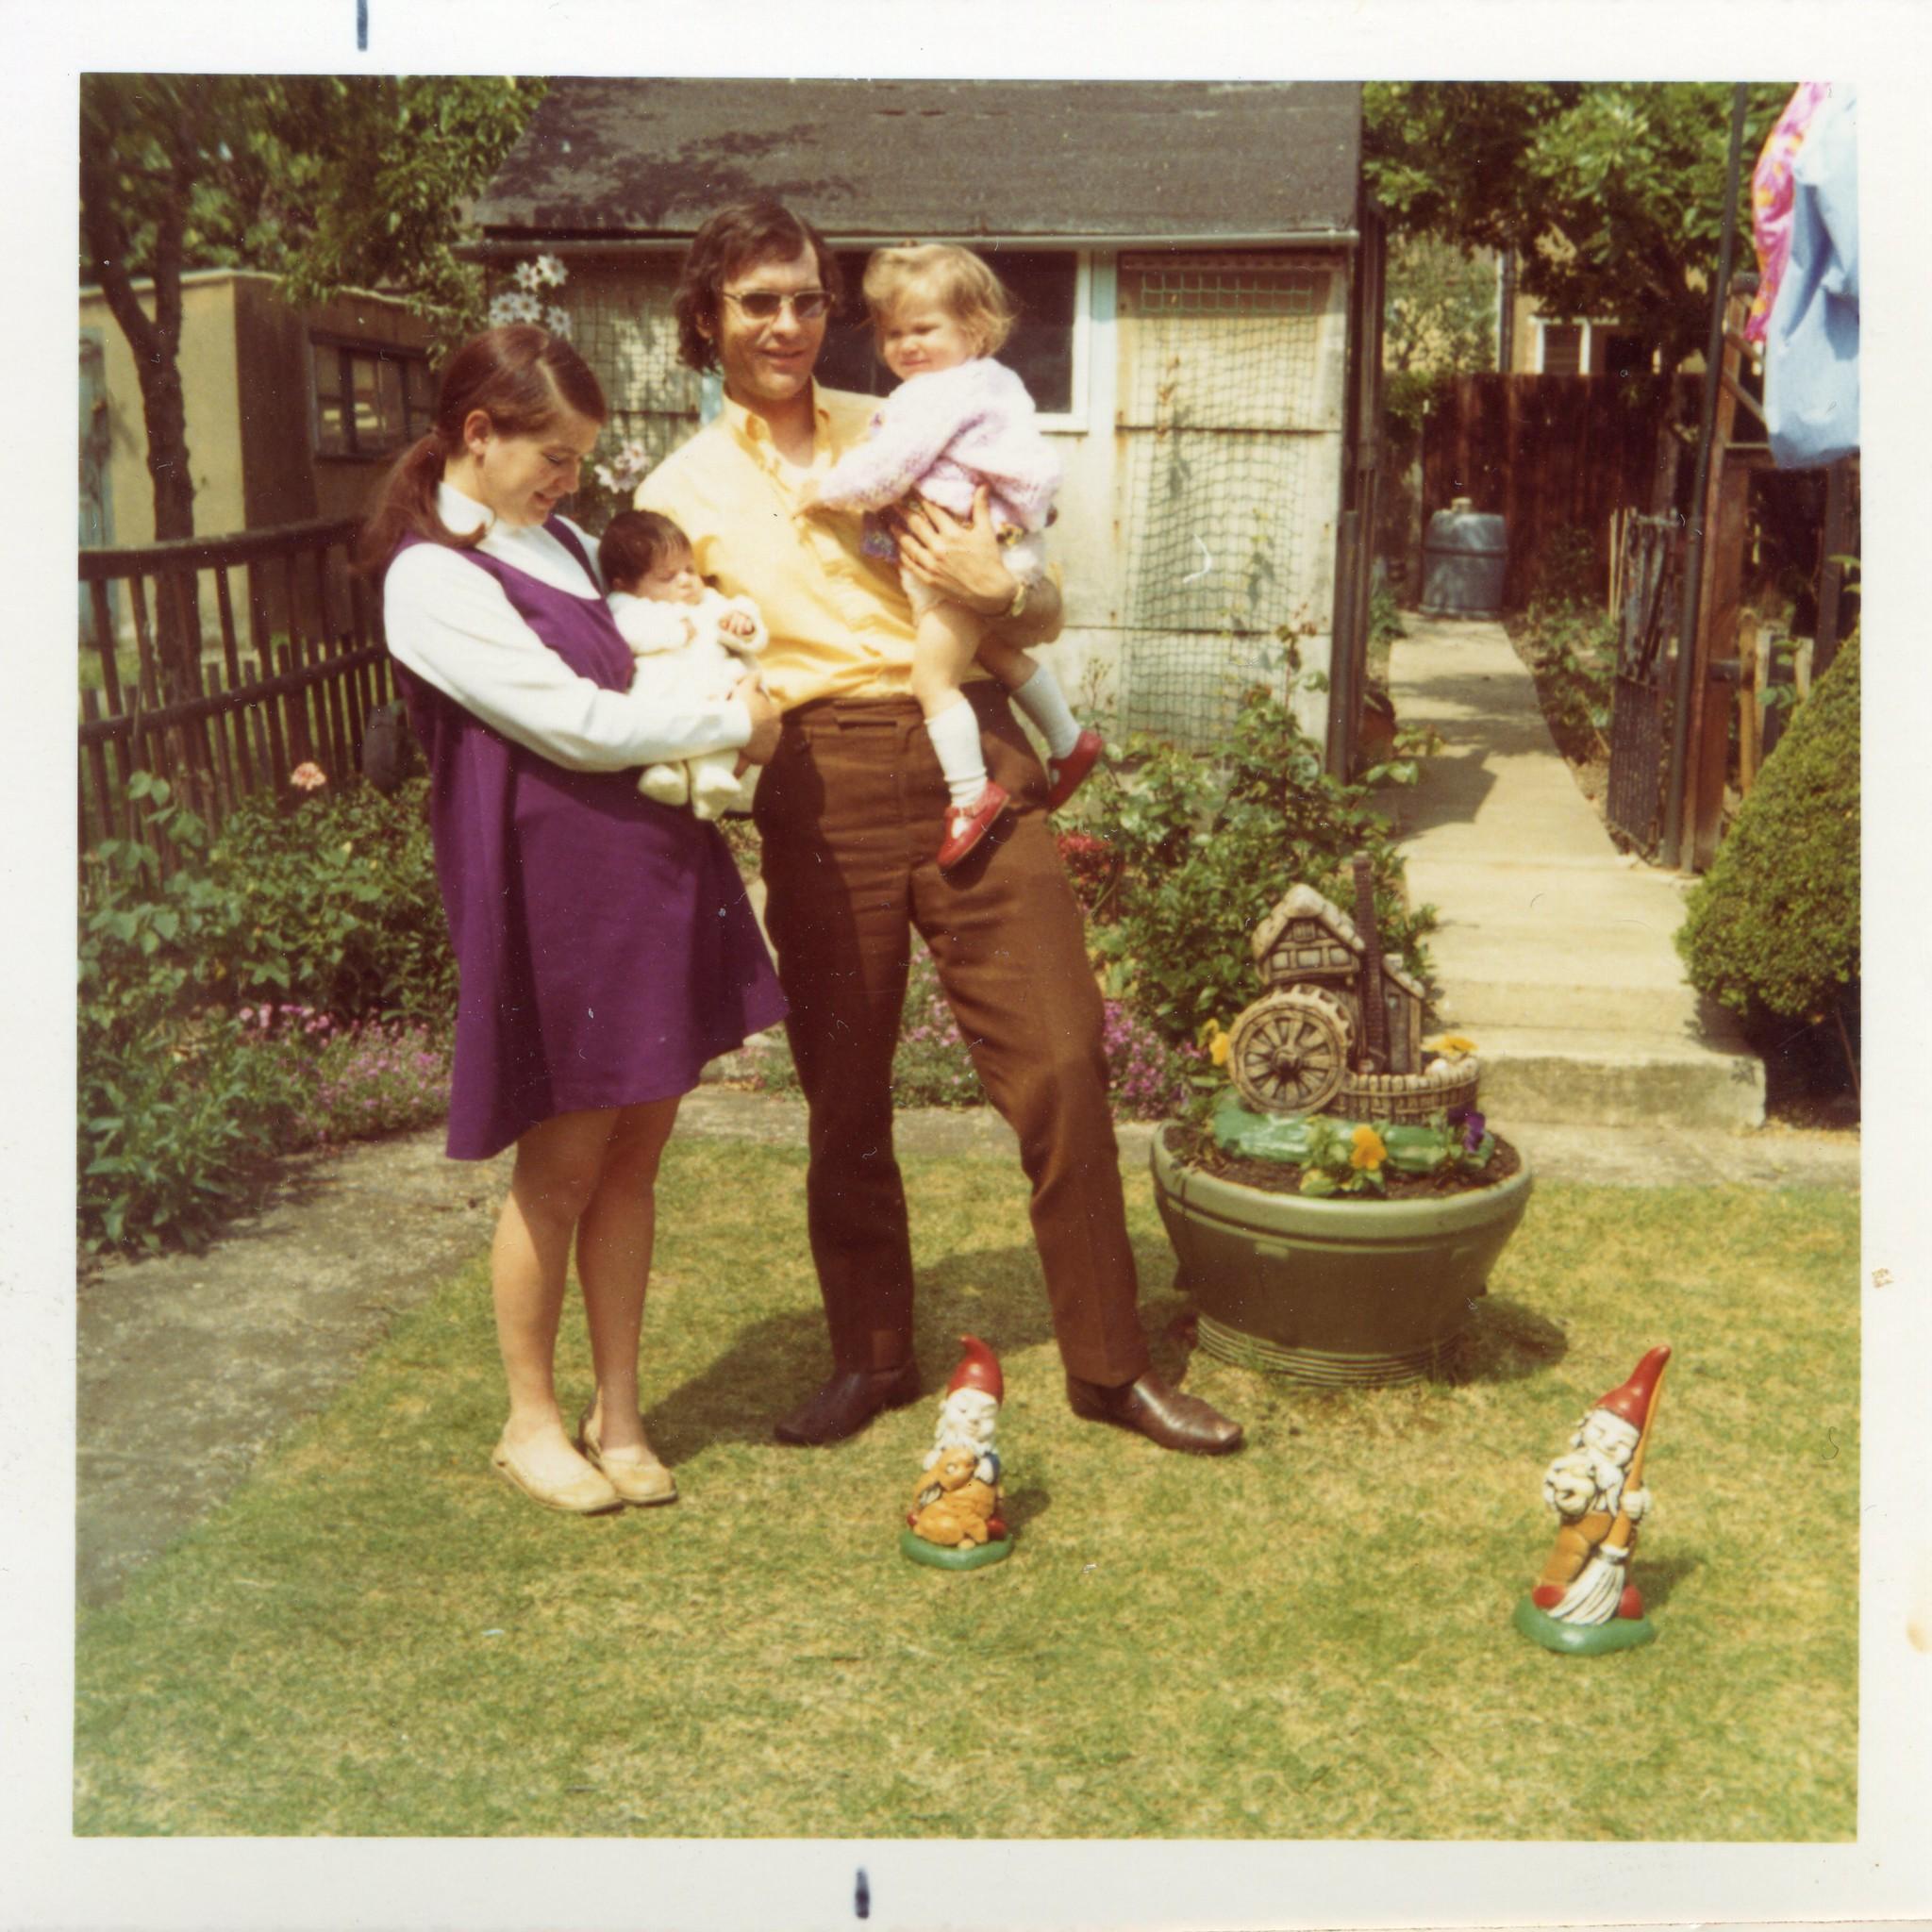 Gnome In Garden: 1970s Family With Garden Gnomes - 2